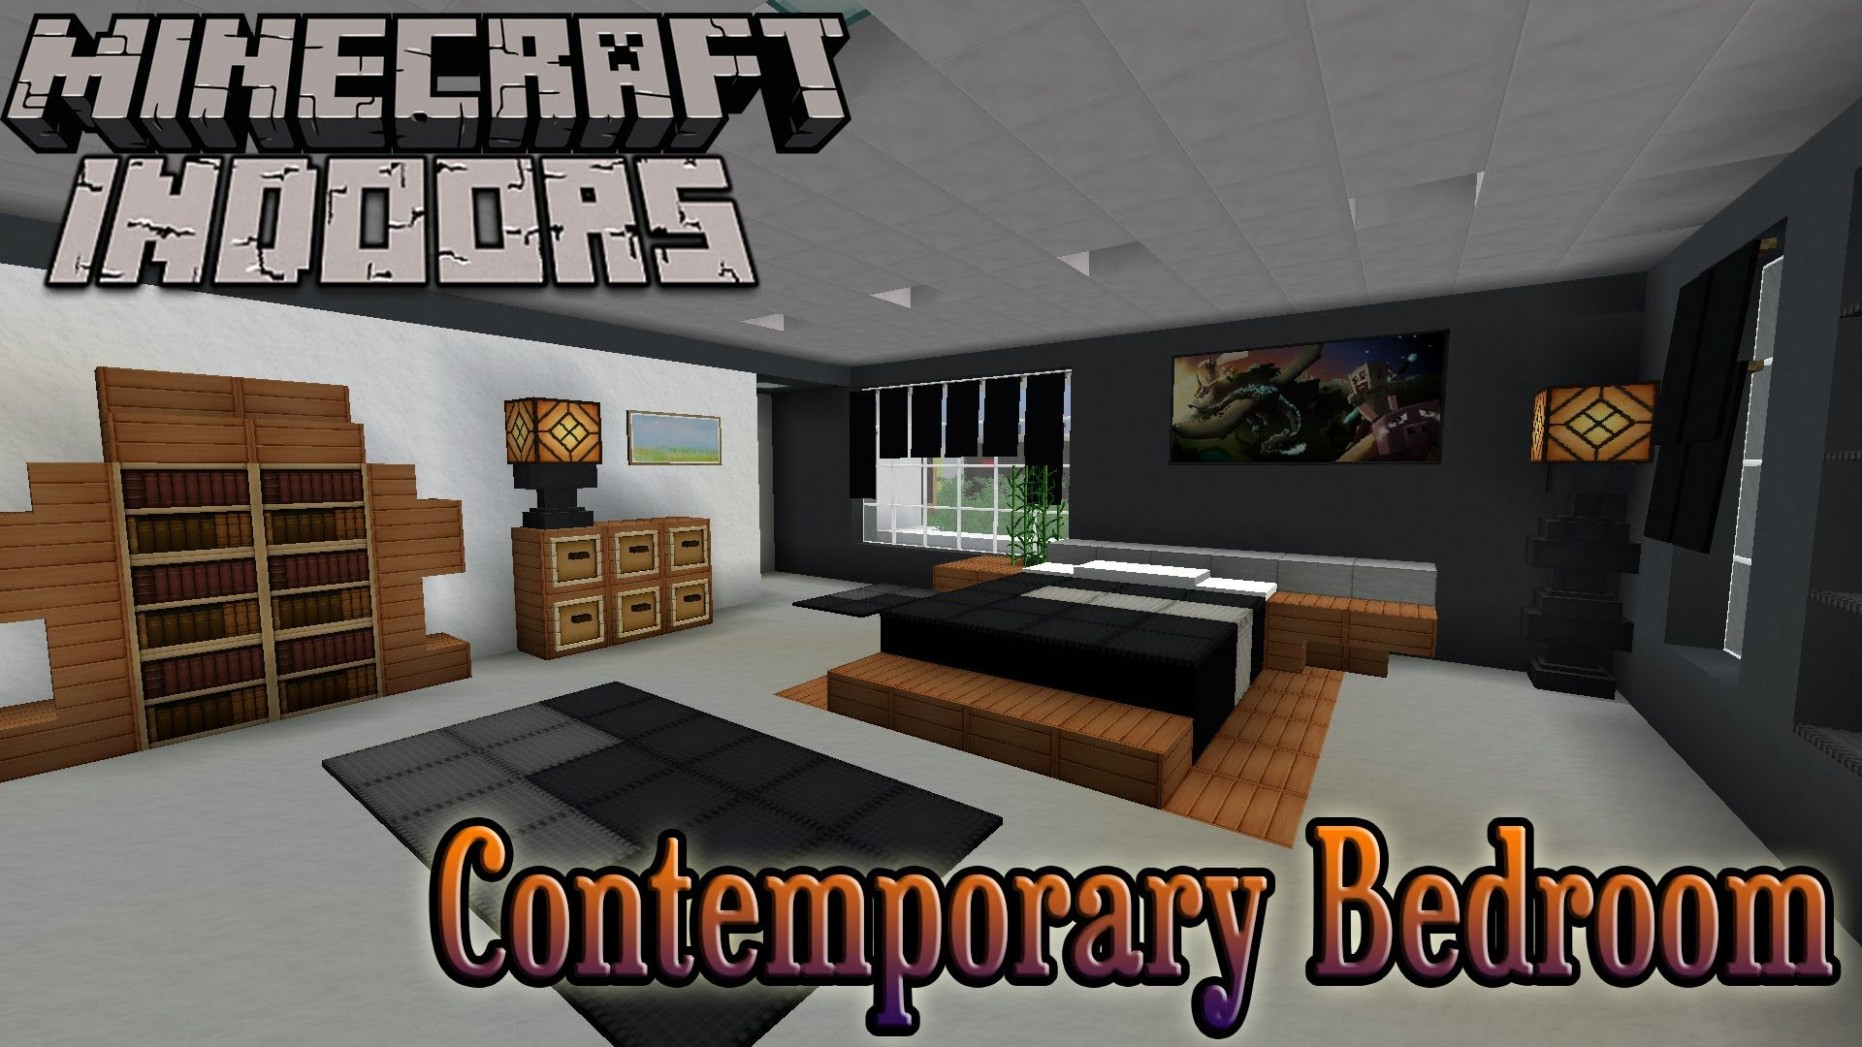 minecraft bedroom ideas - Google Search  Minecraft bedroom  - Bedroom Ideas In Minecraft